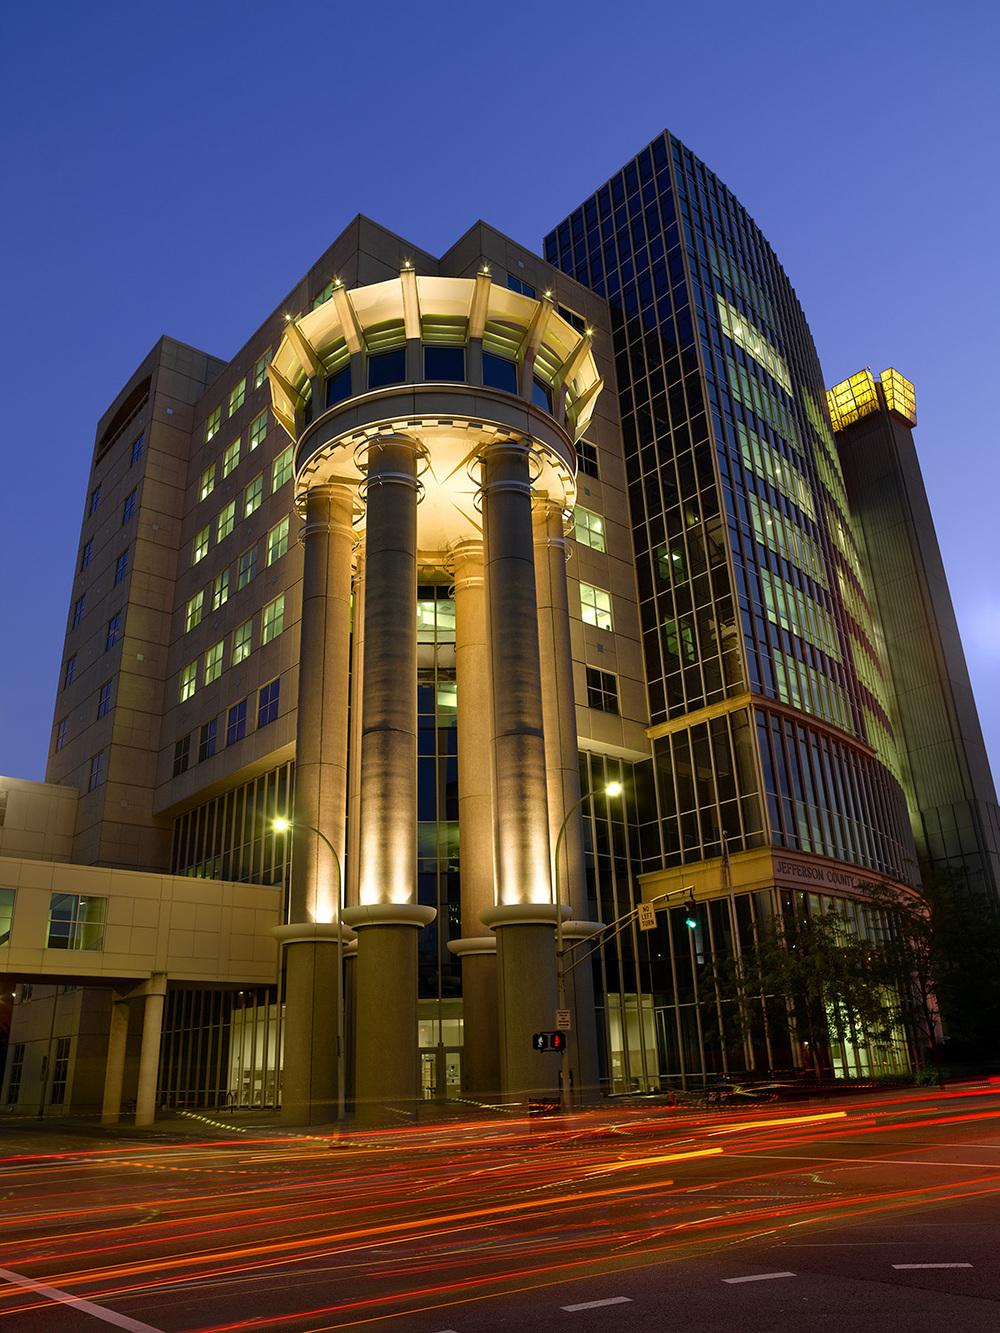 Judical_Center_3 -SQ-1500pix copy.jpg